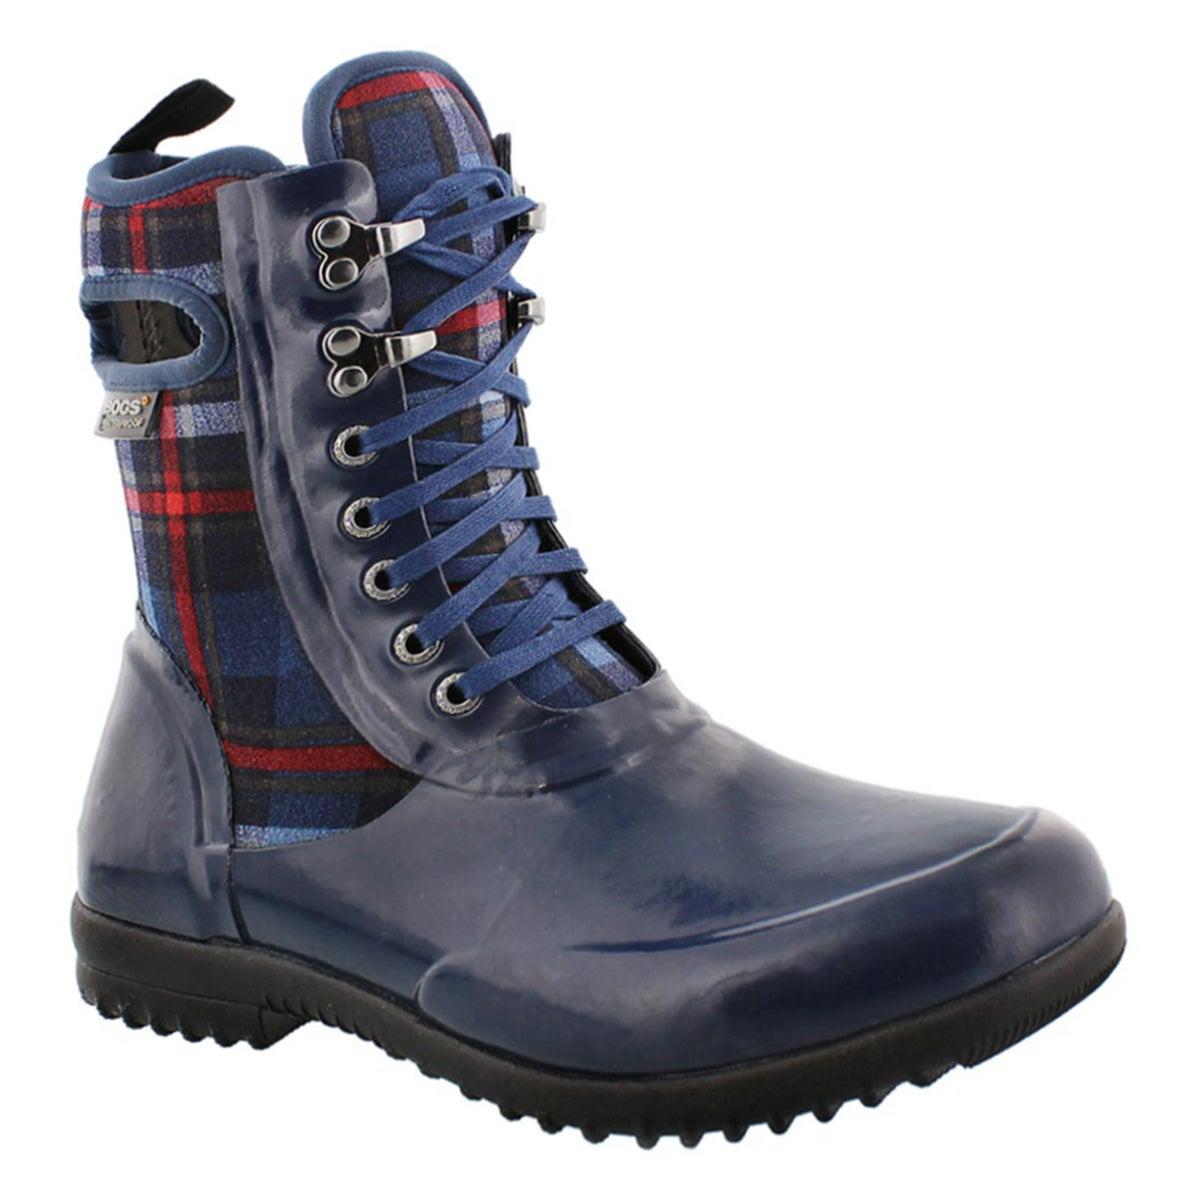 Lds Sidney Lace Plaid dk blue wtpf boot